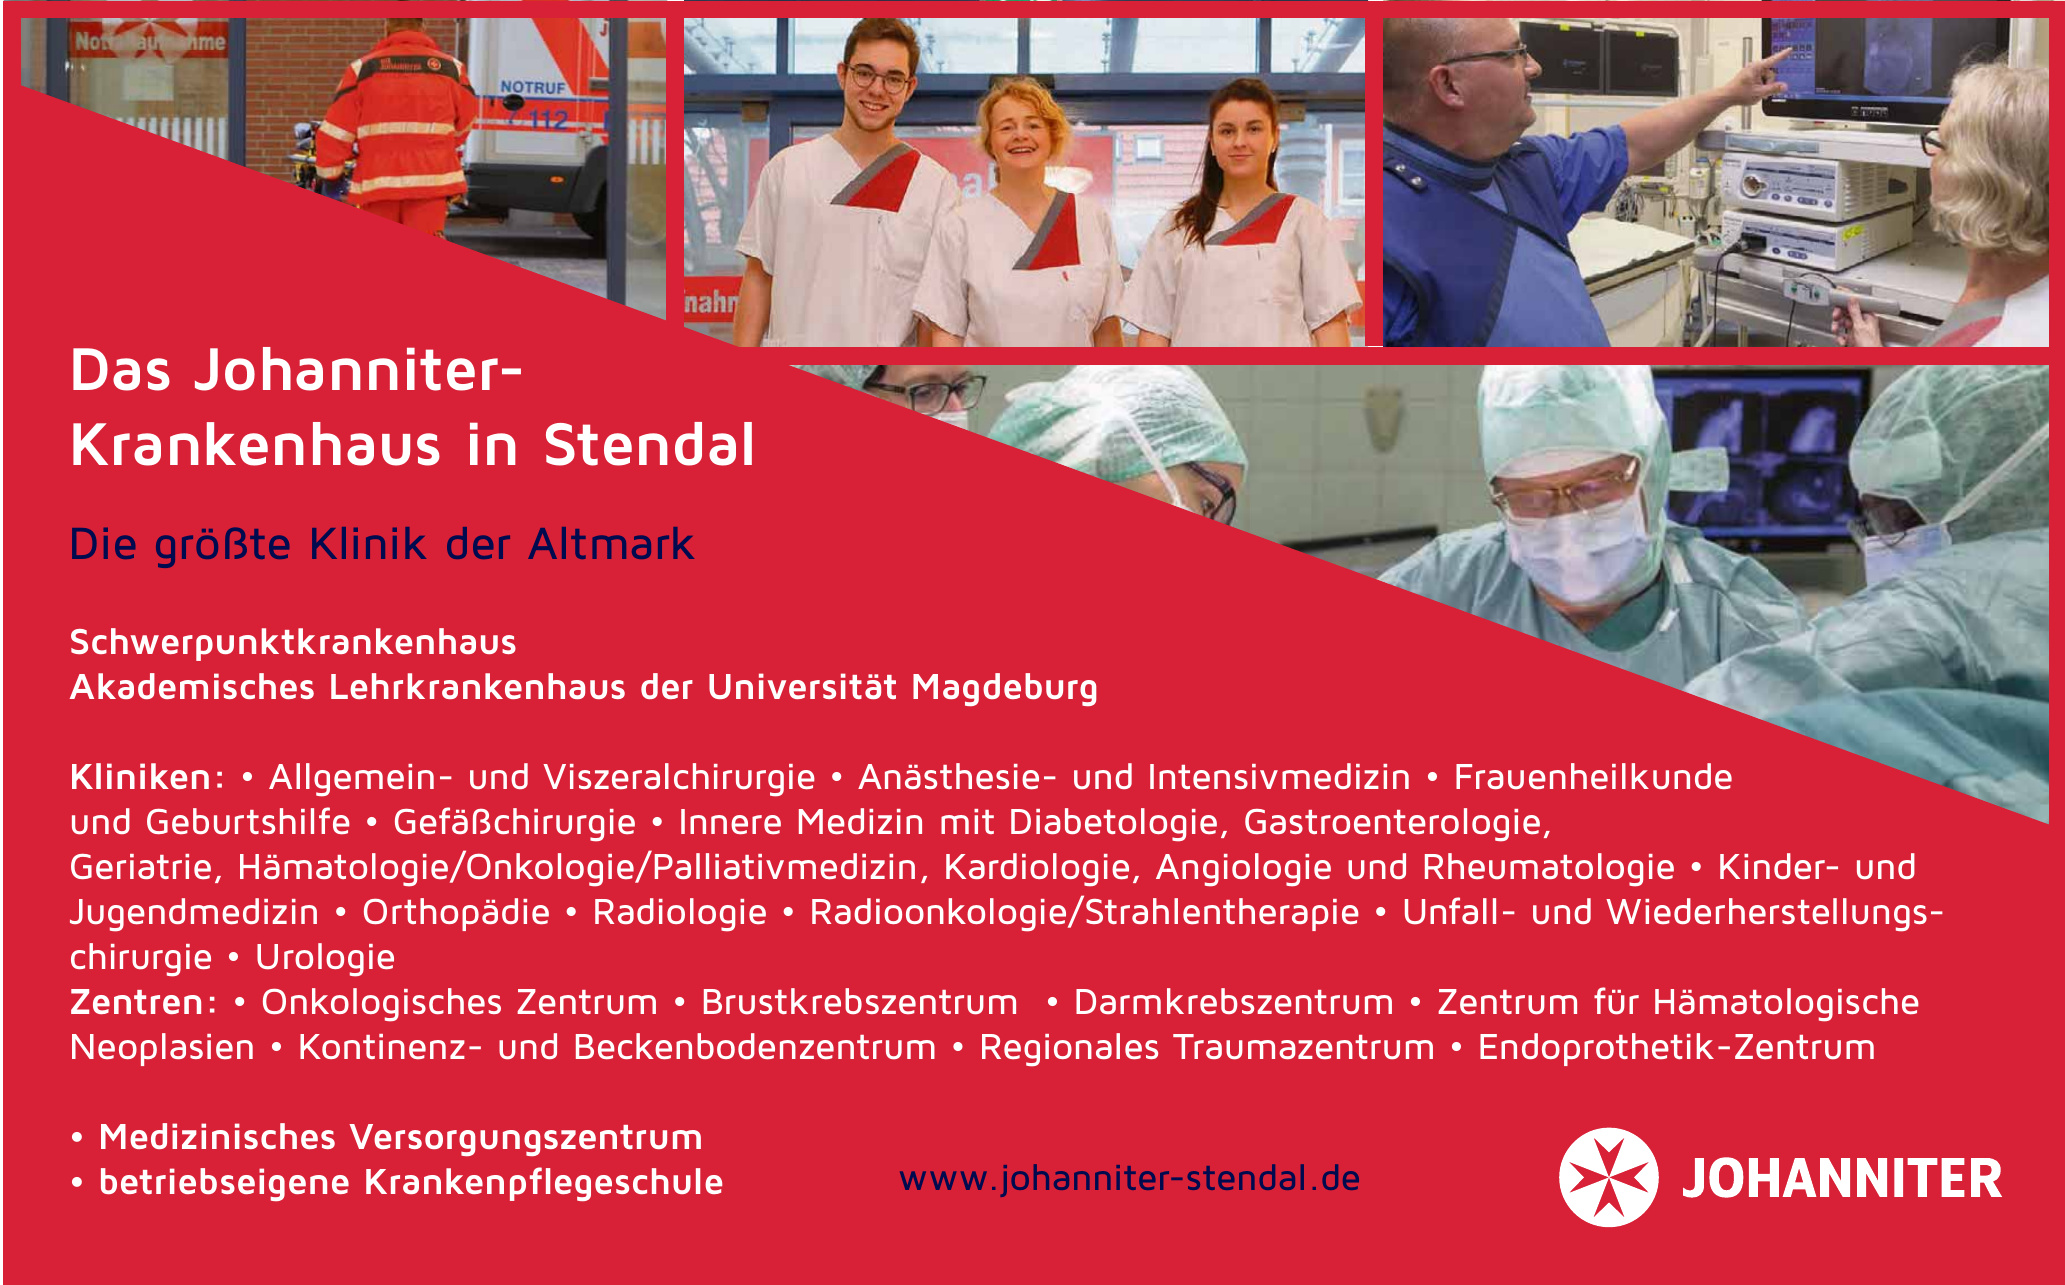 Die Johanniter - Johanniter-Krankenhaus Stendal